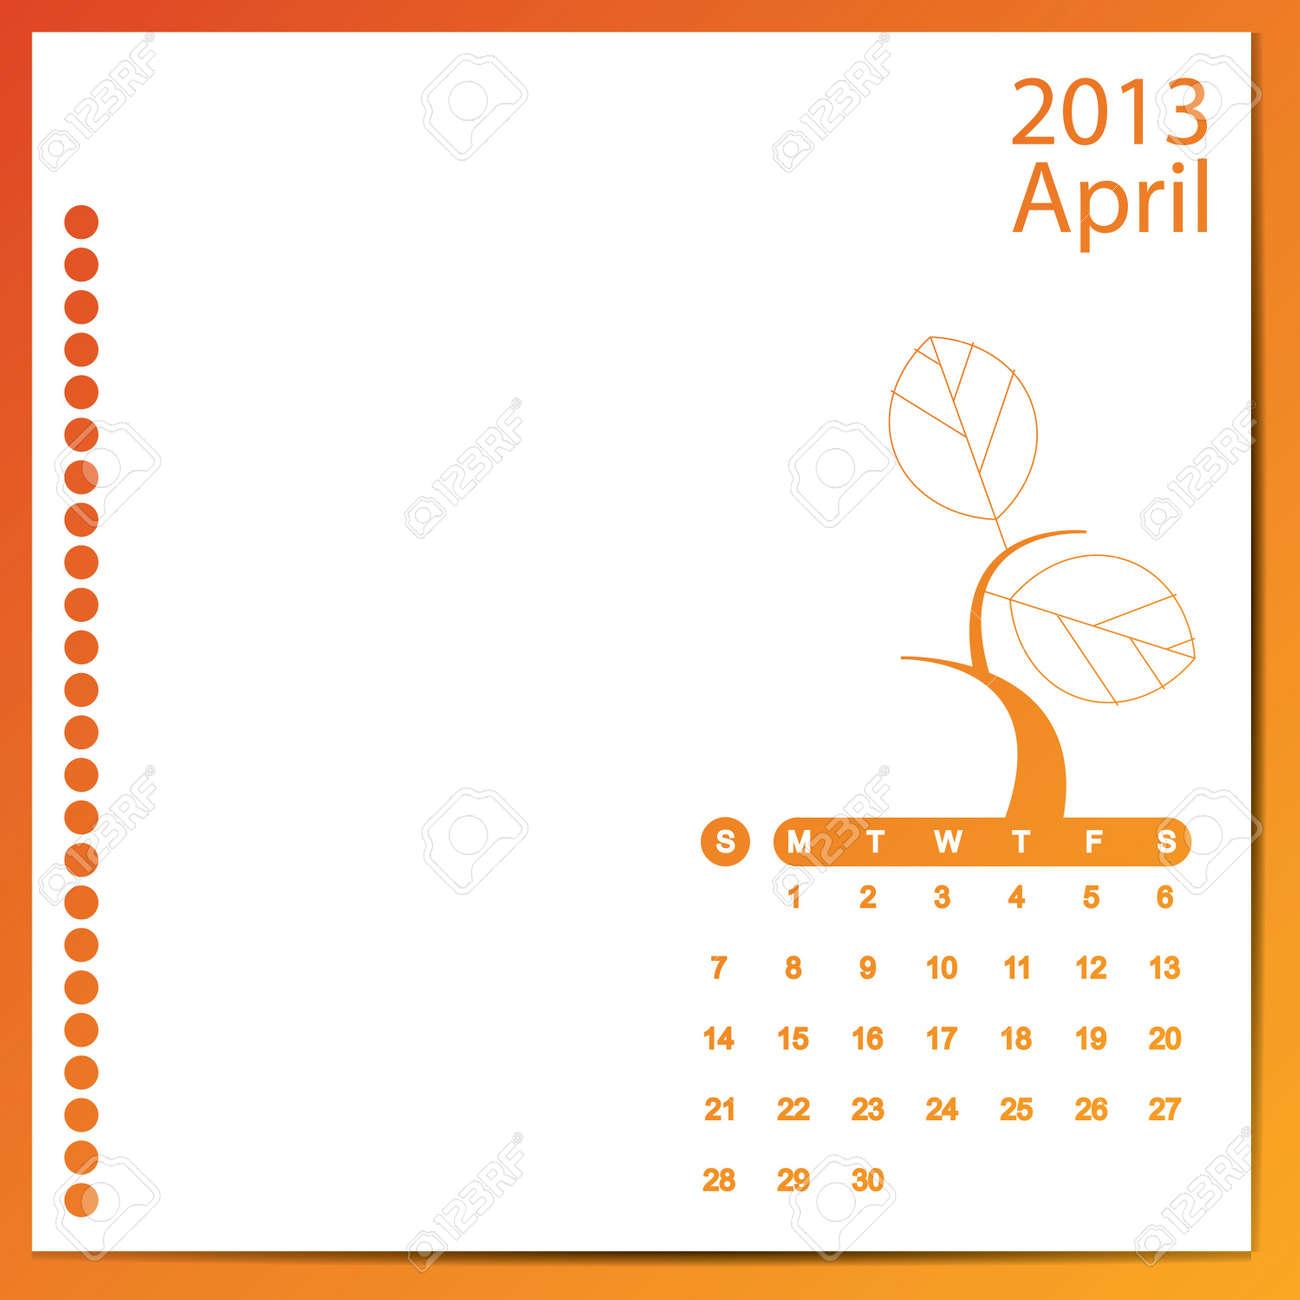 April 2013 Stock Vector - 16699601